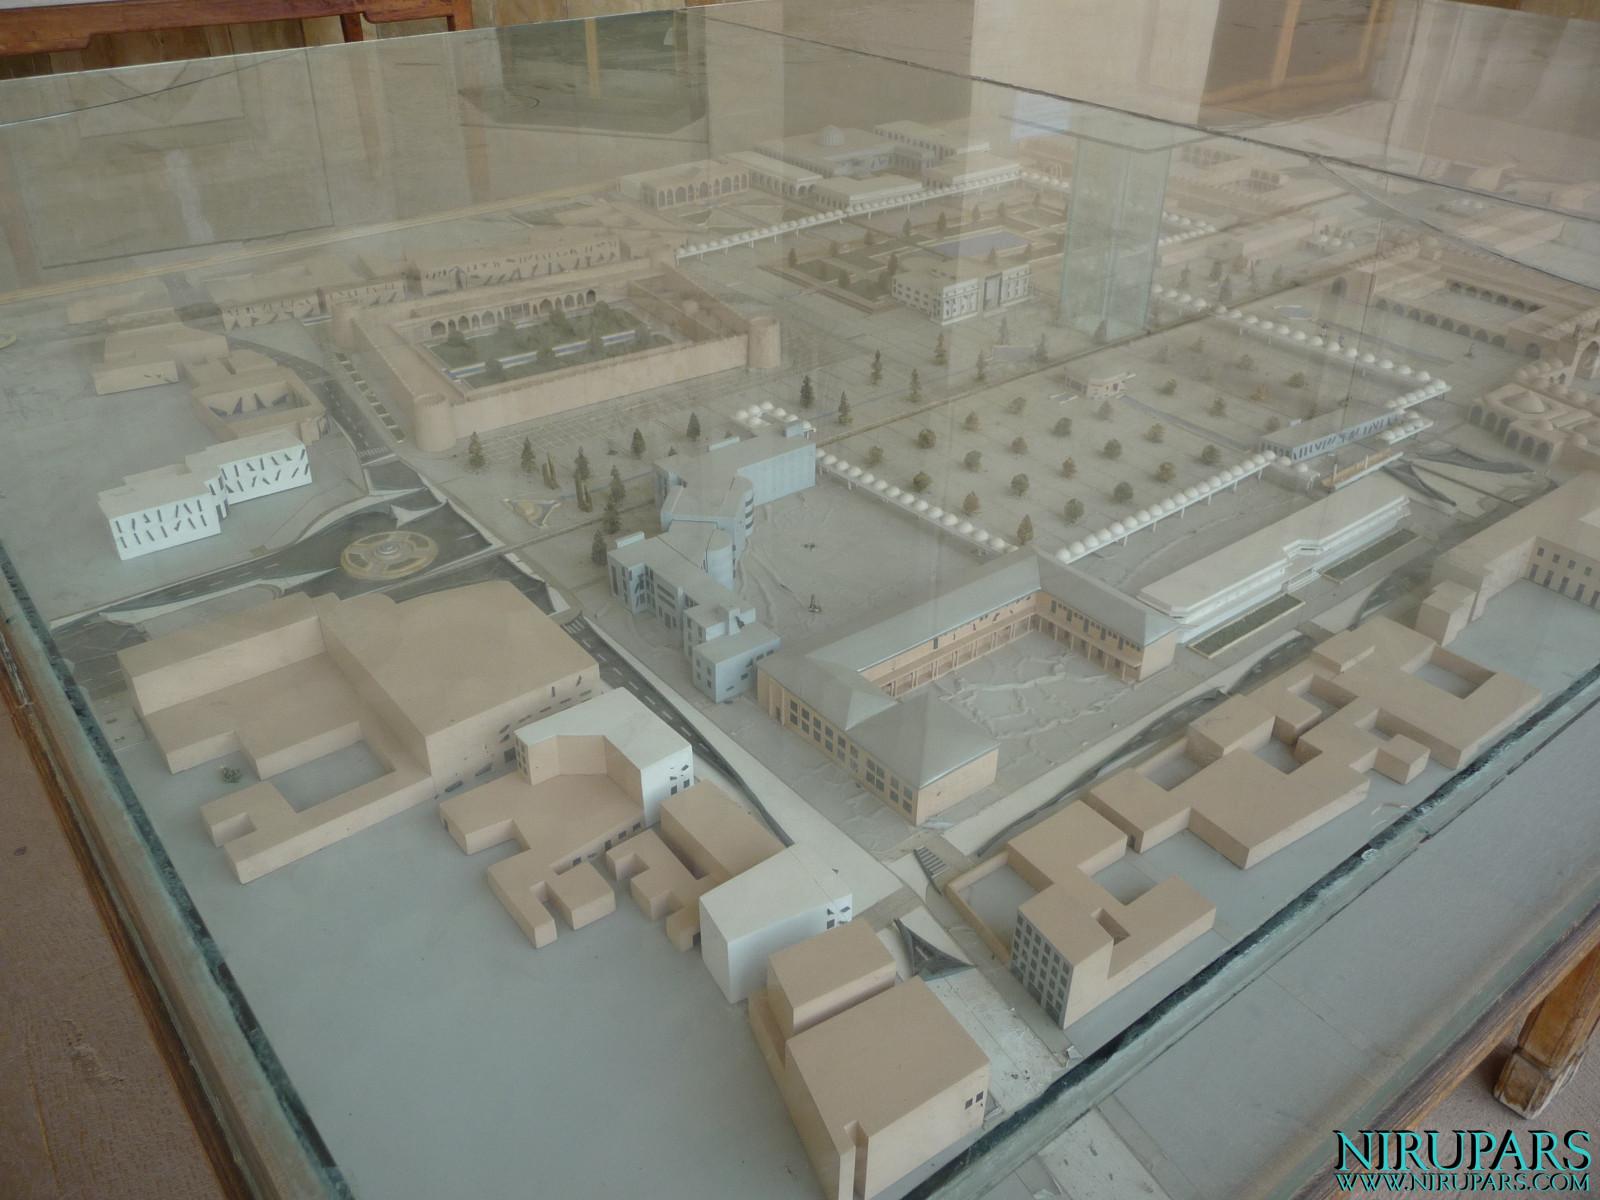 Arg-e Karim Khan - Miniature model